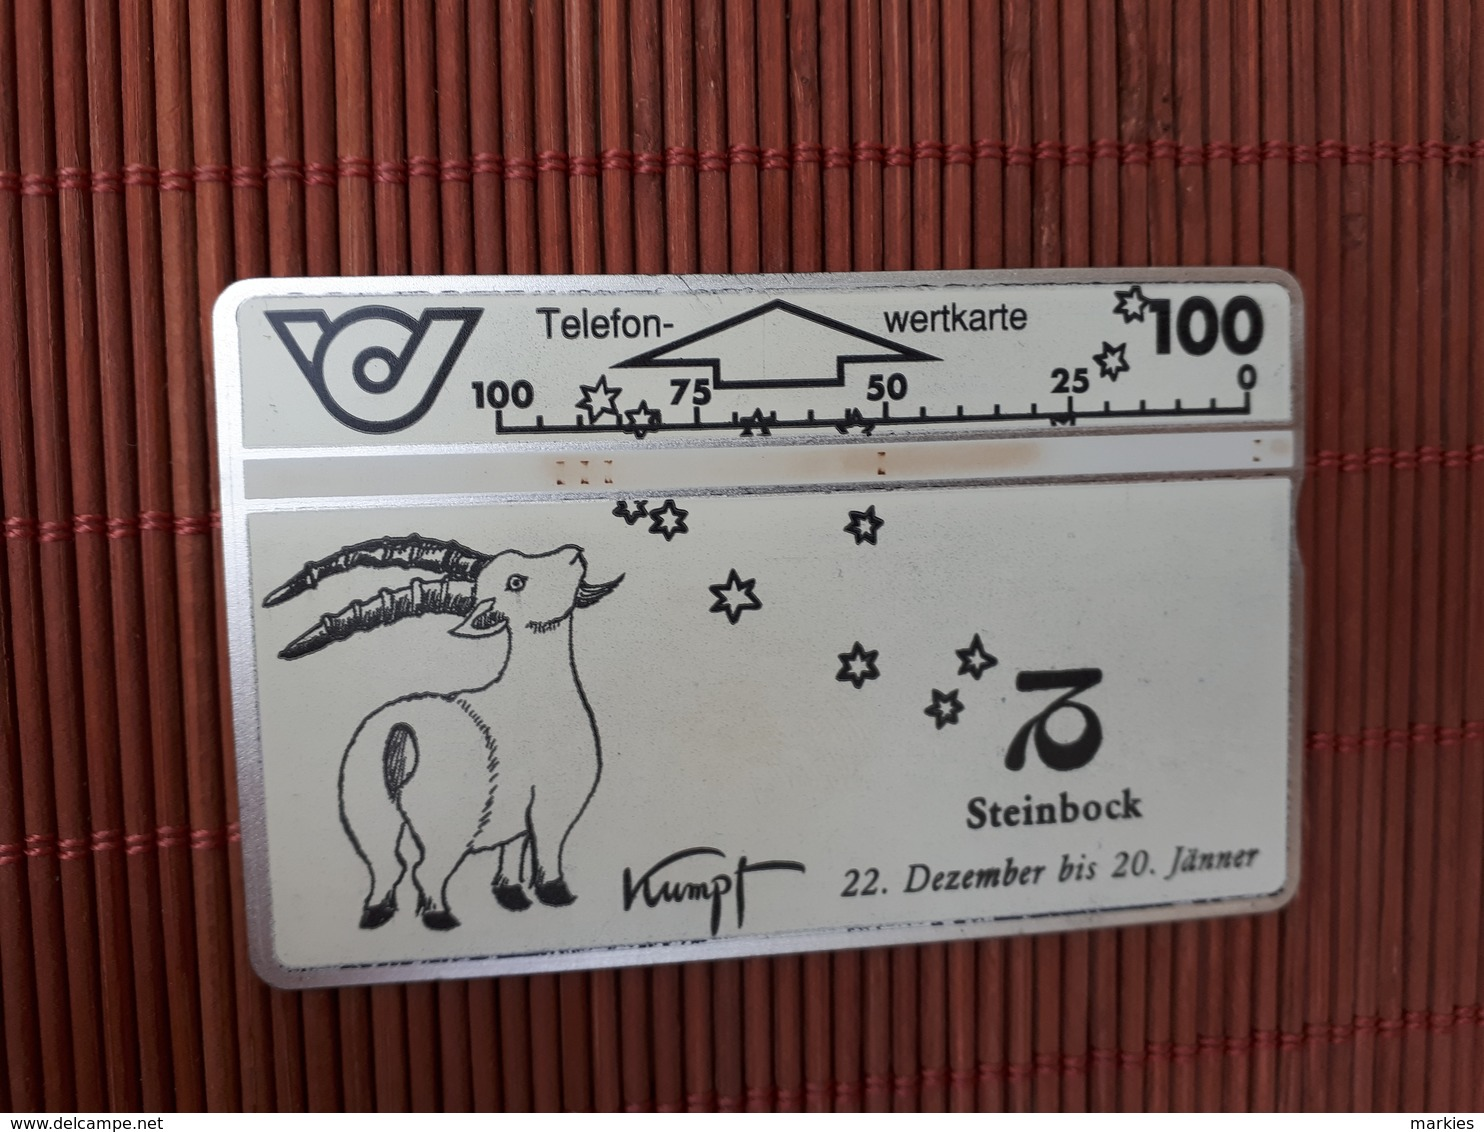 Phonecard Horoscope Zodiac - Zodiaco